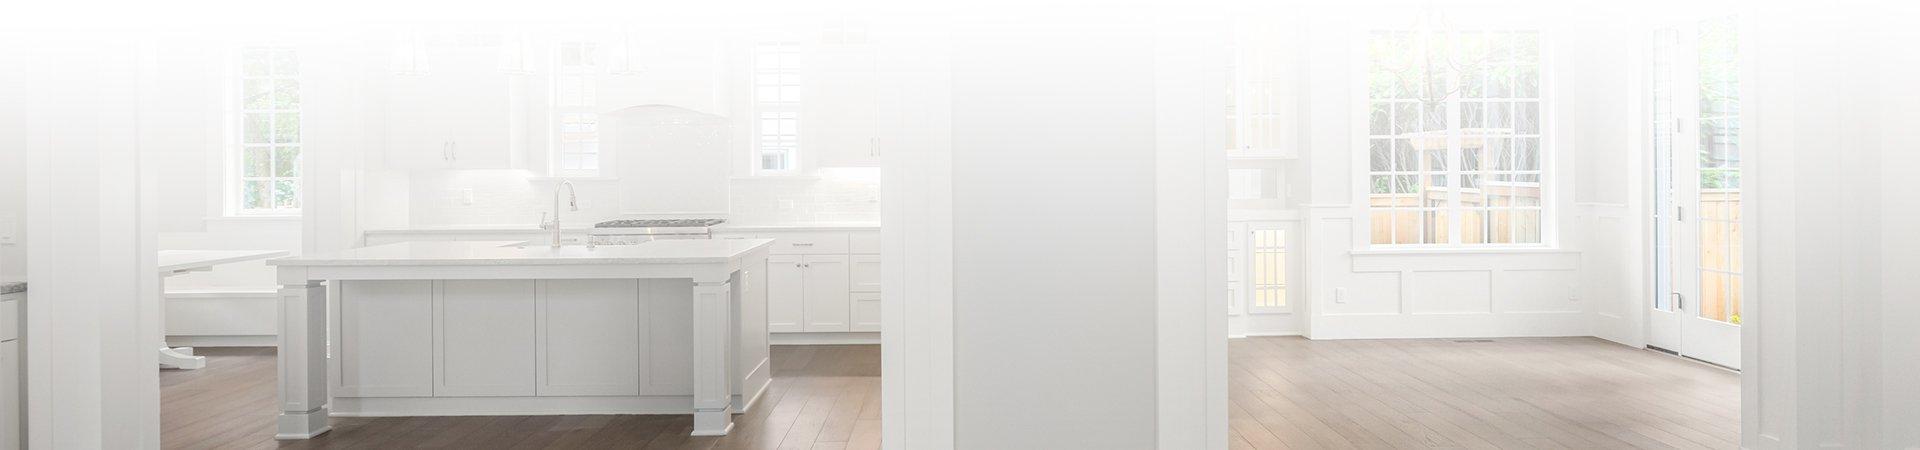 AG Design Toronto Architect Firm - Kitchen-Design